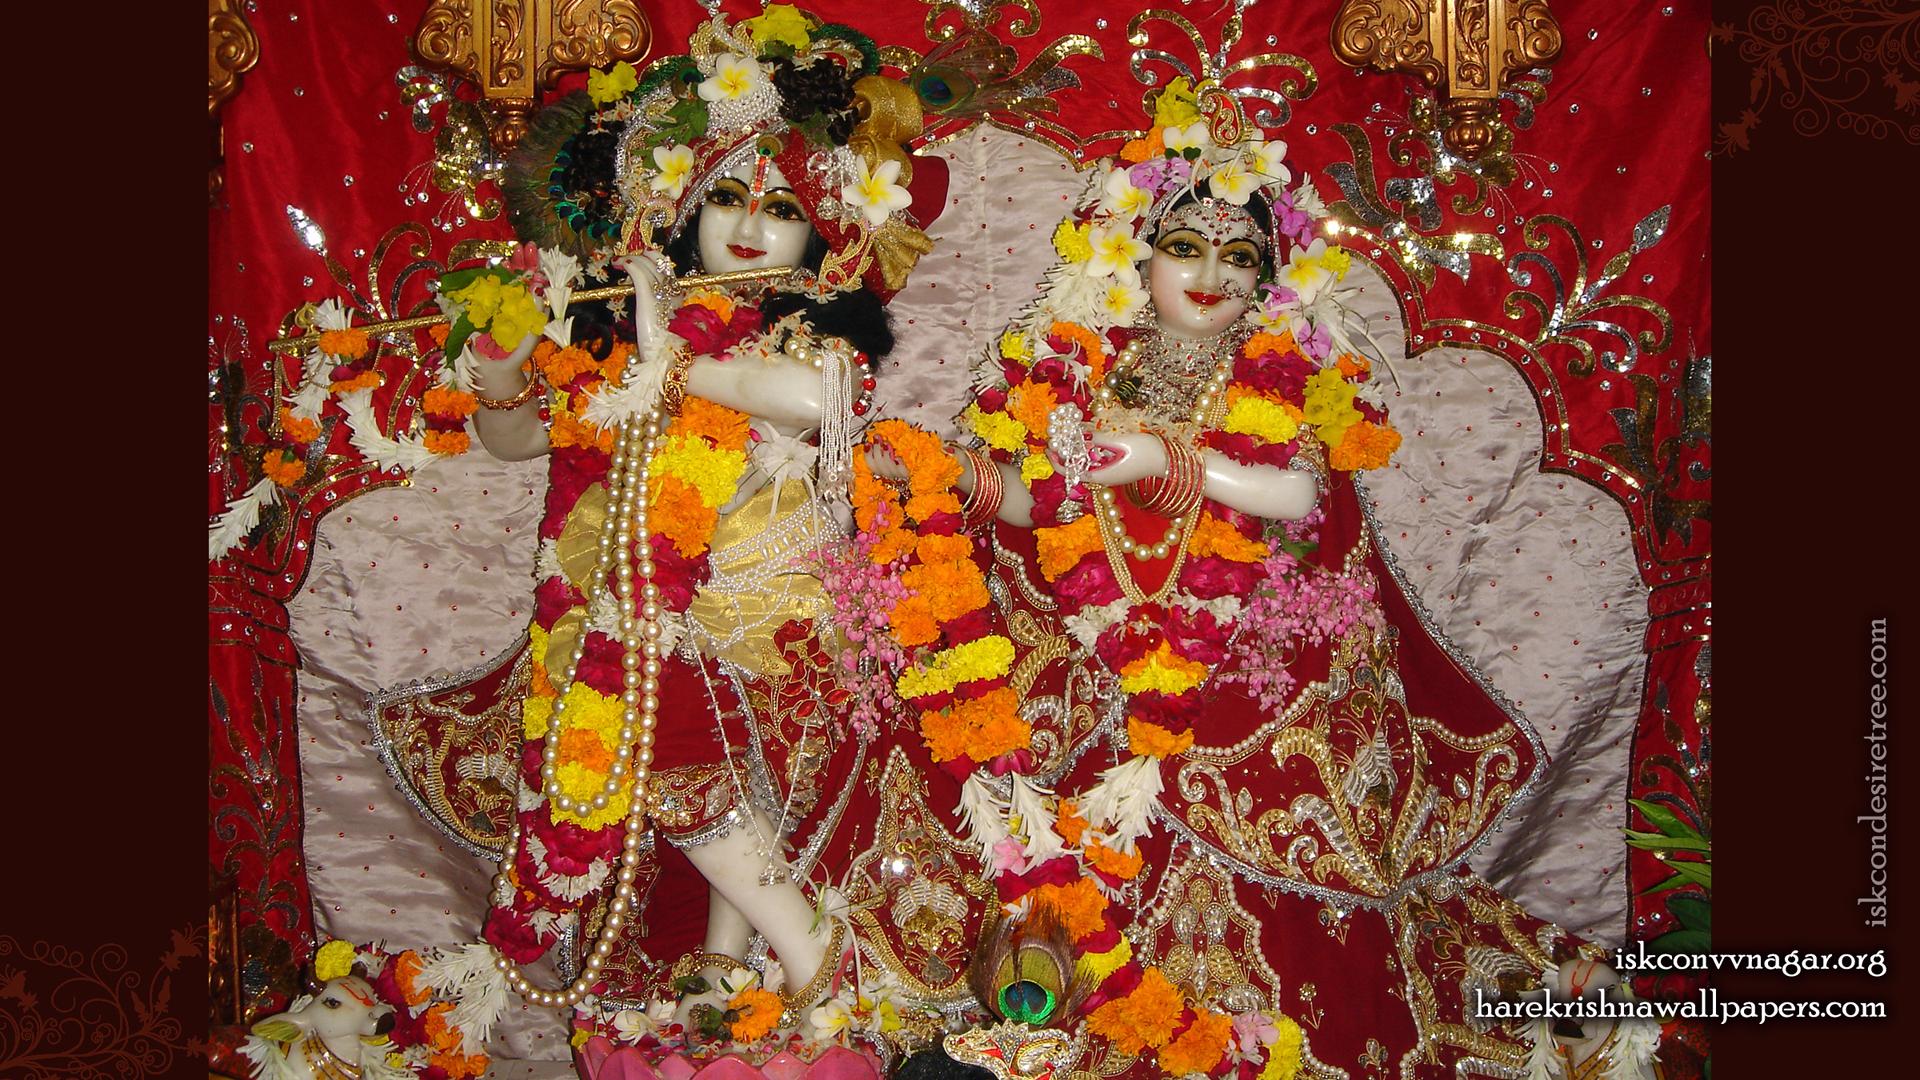 Sri Sri Radha Giridhari Wallpaper (027) Size 1920x1080 Download